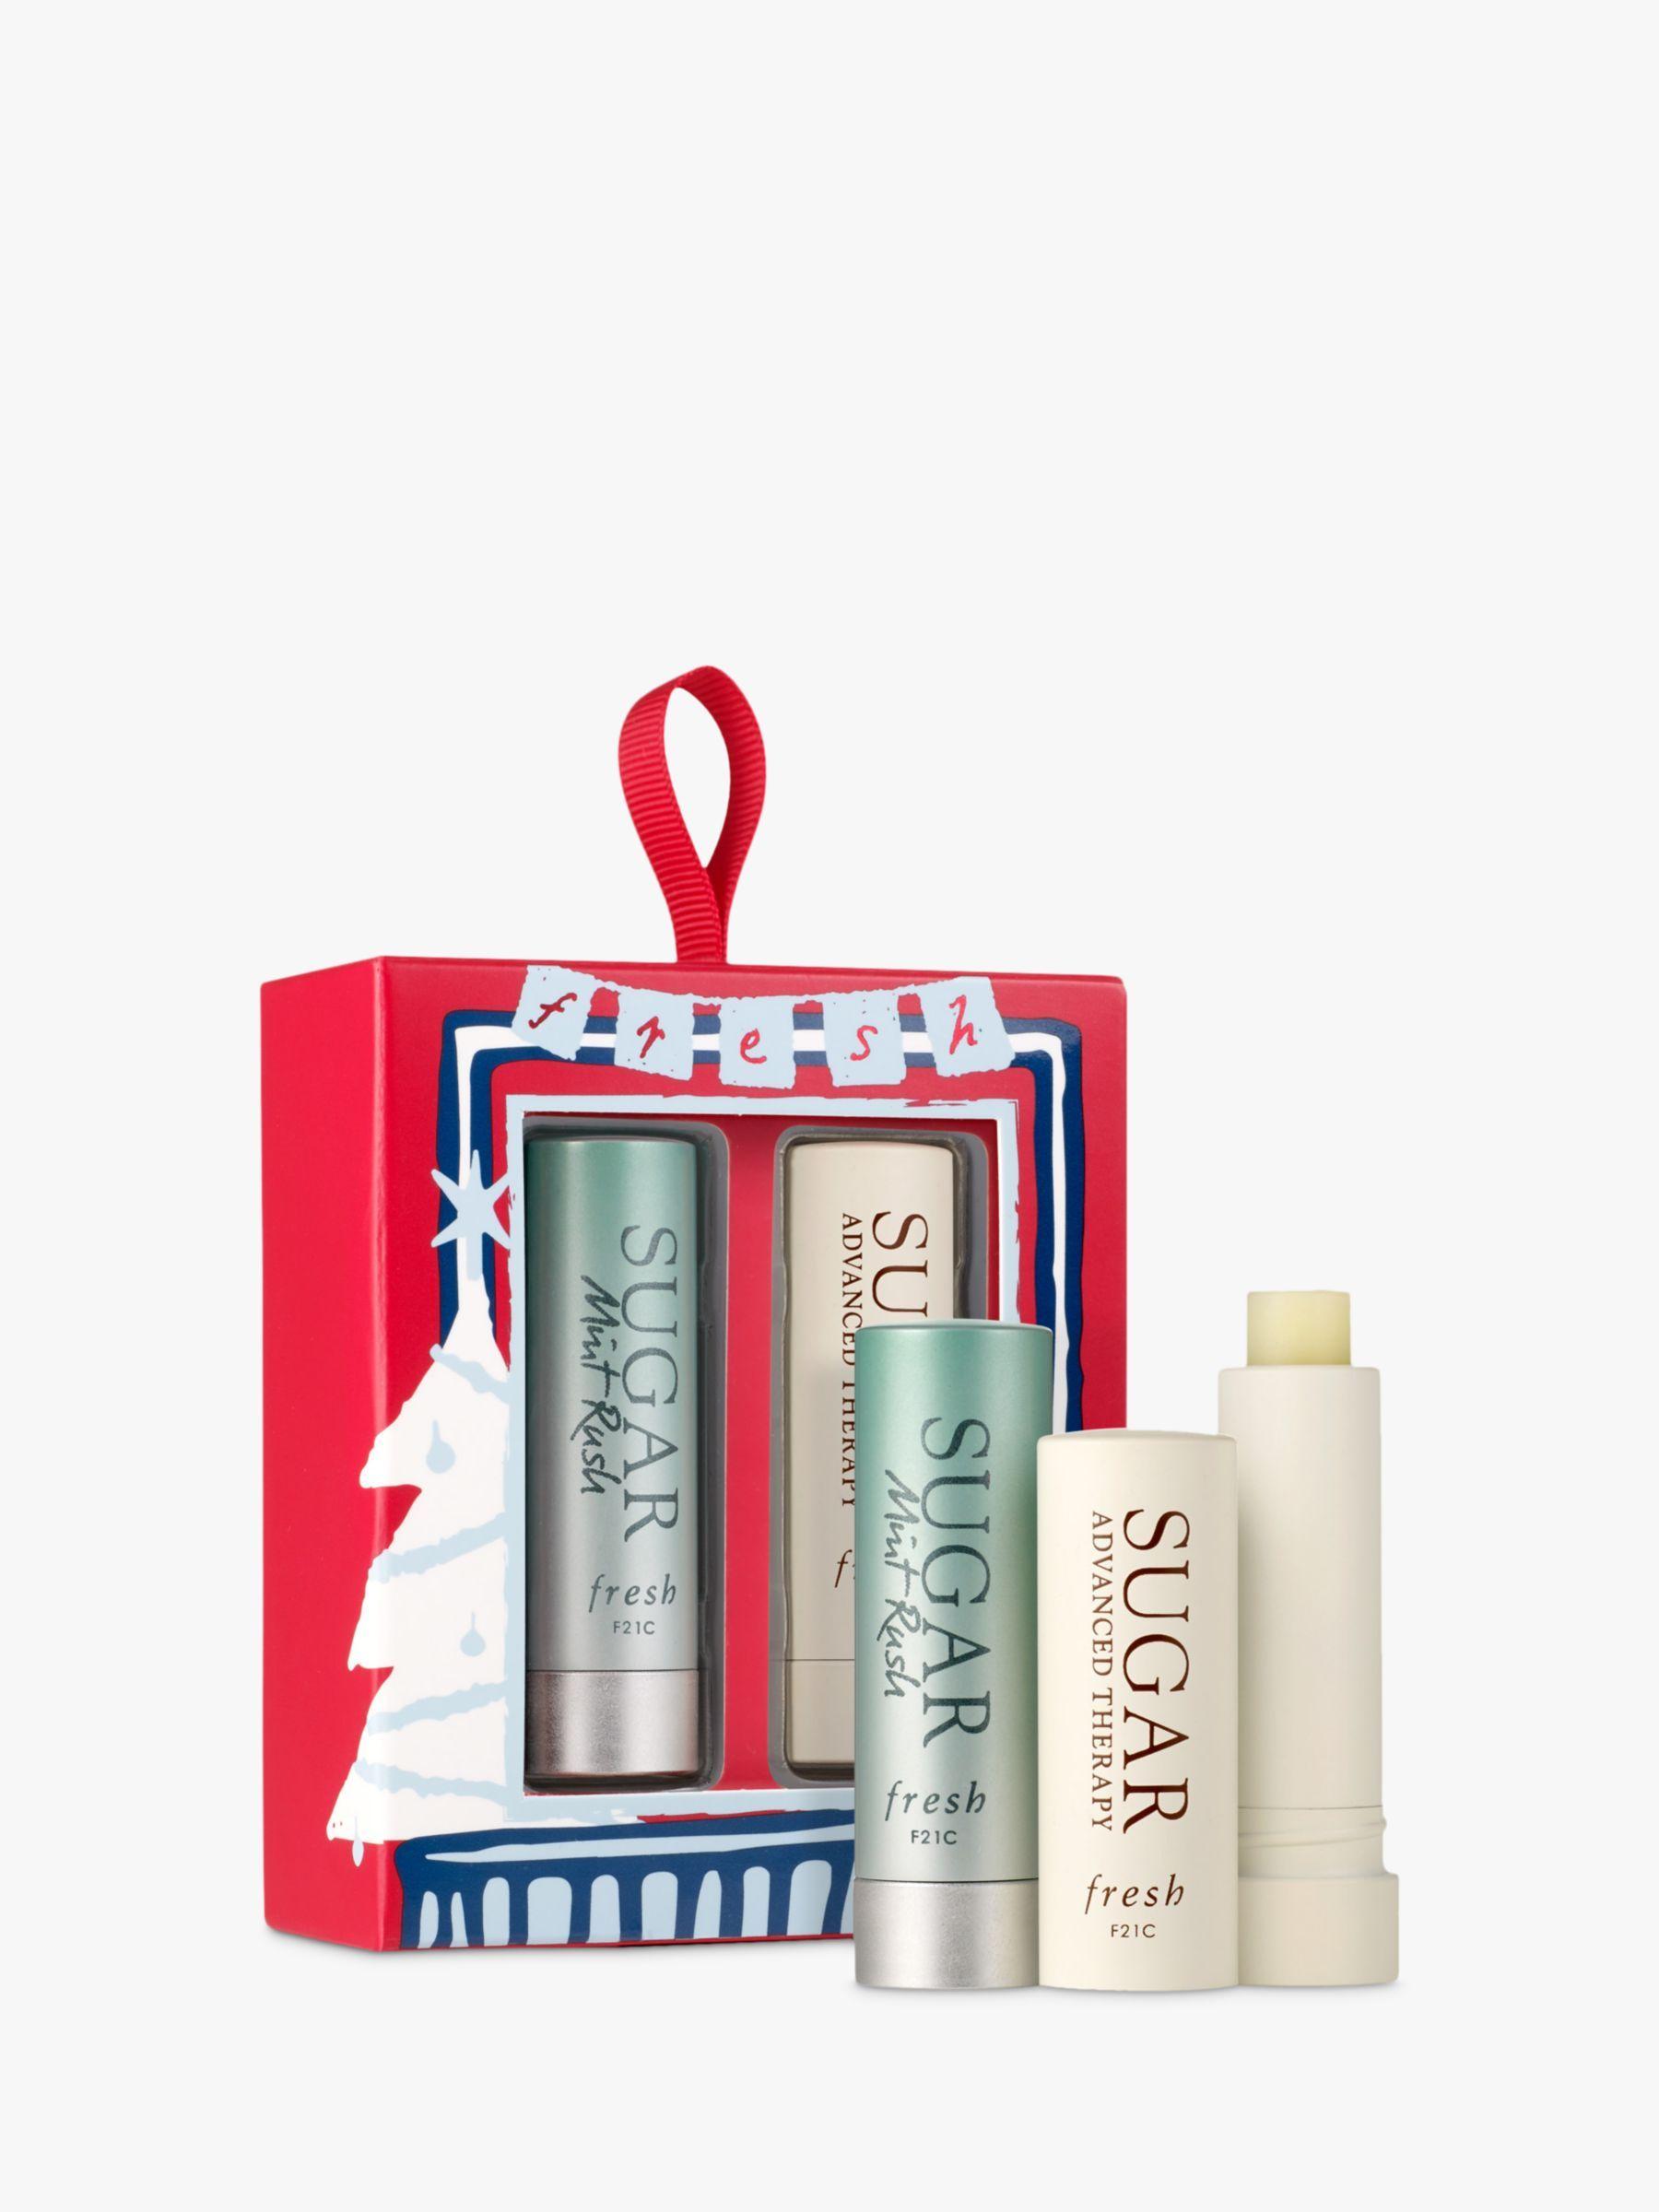 Fresh Minty Magic Skincare Gift Set Skincare gift set